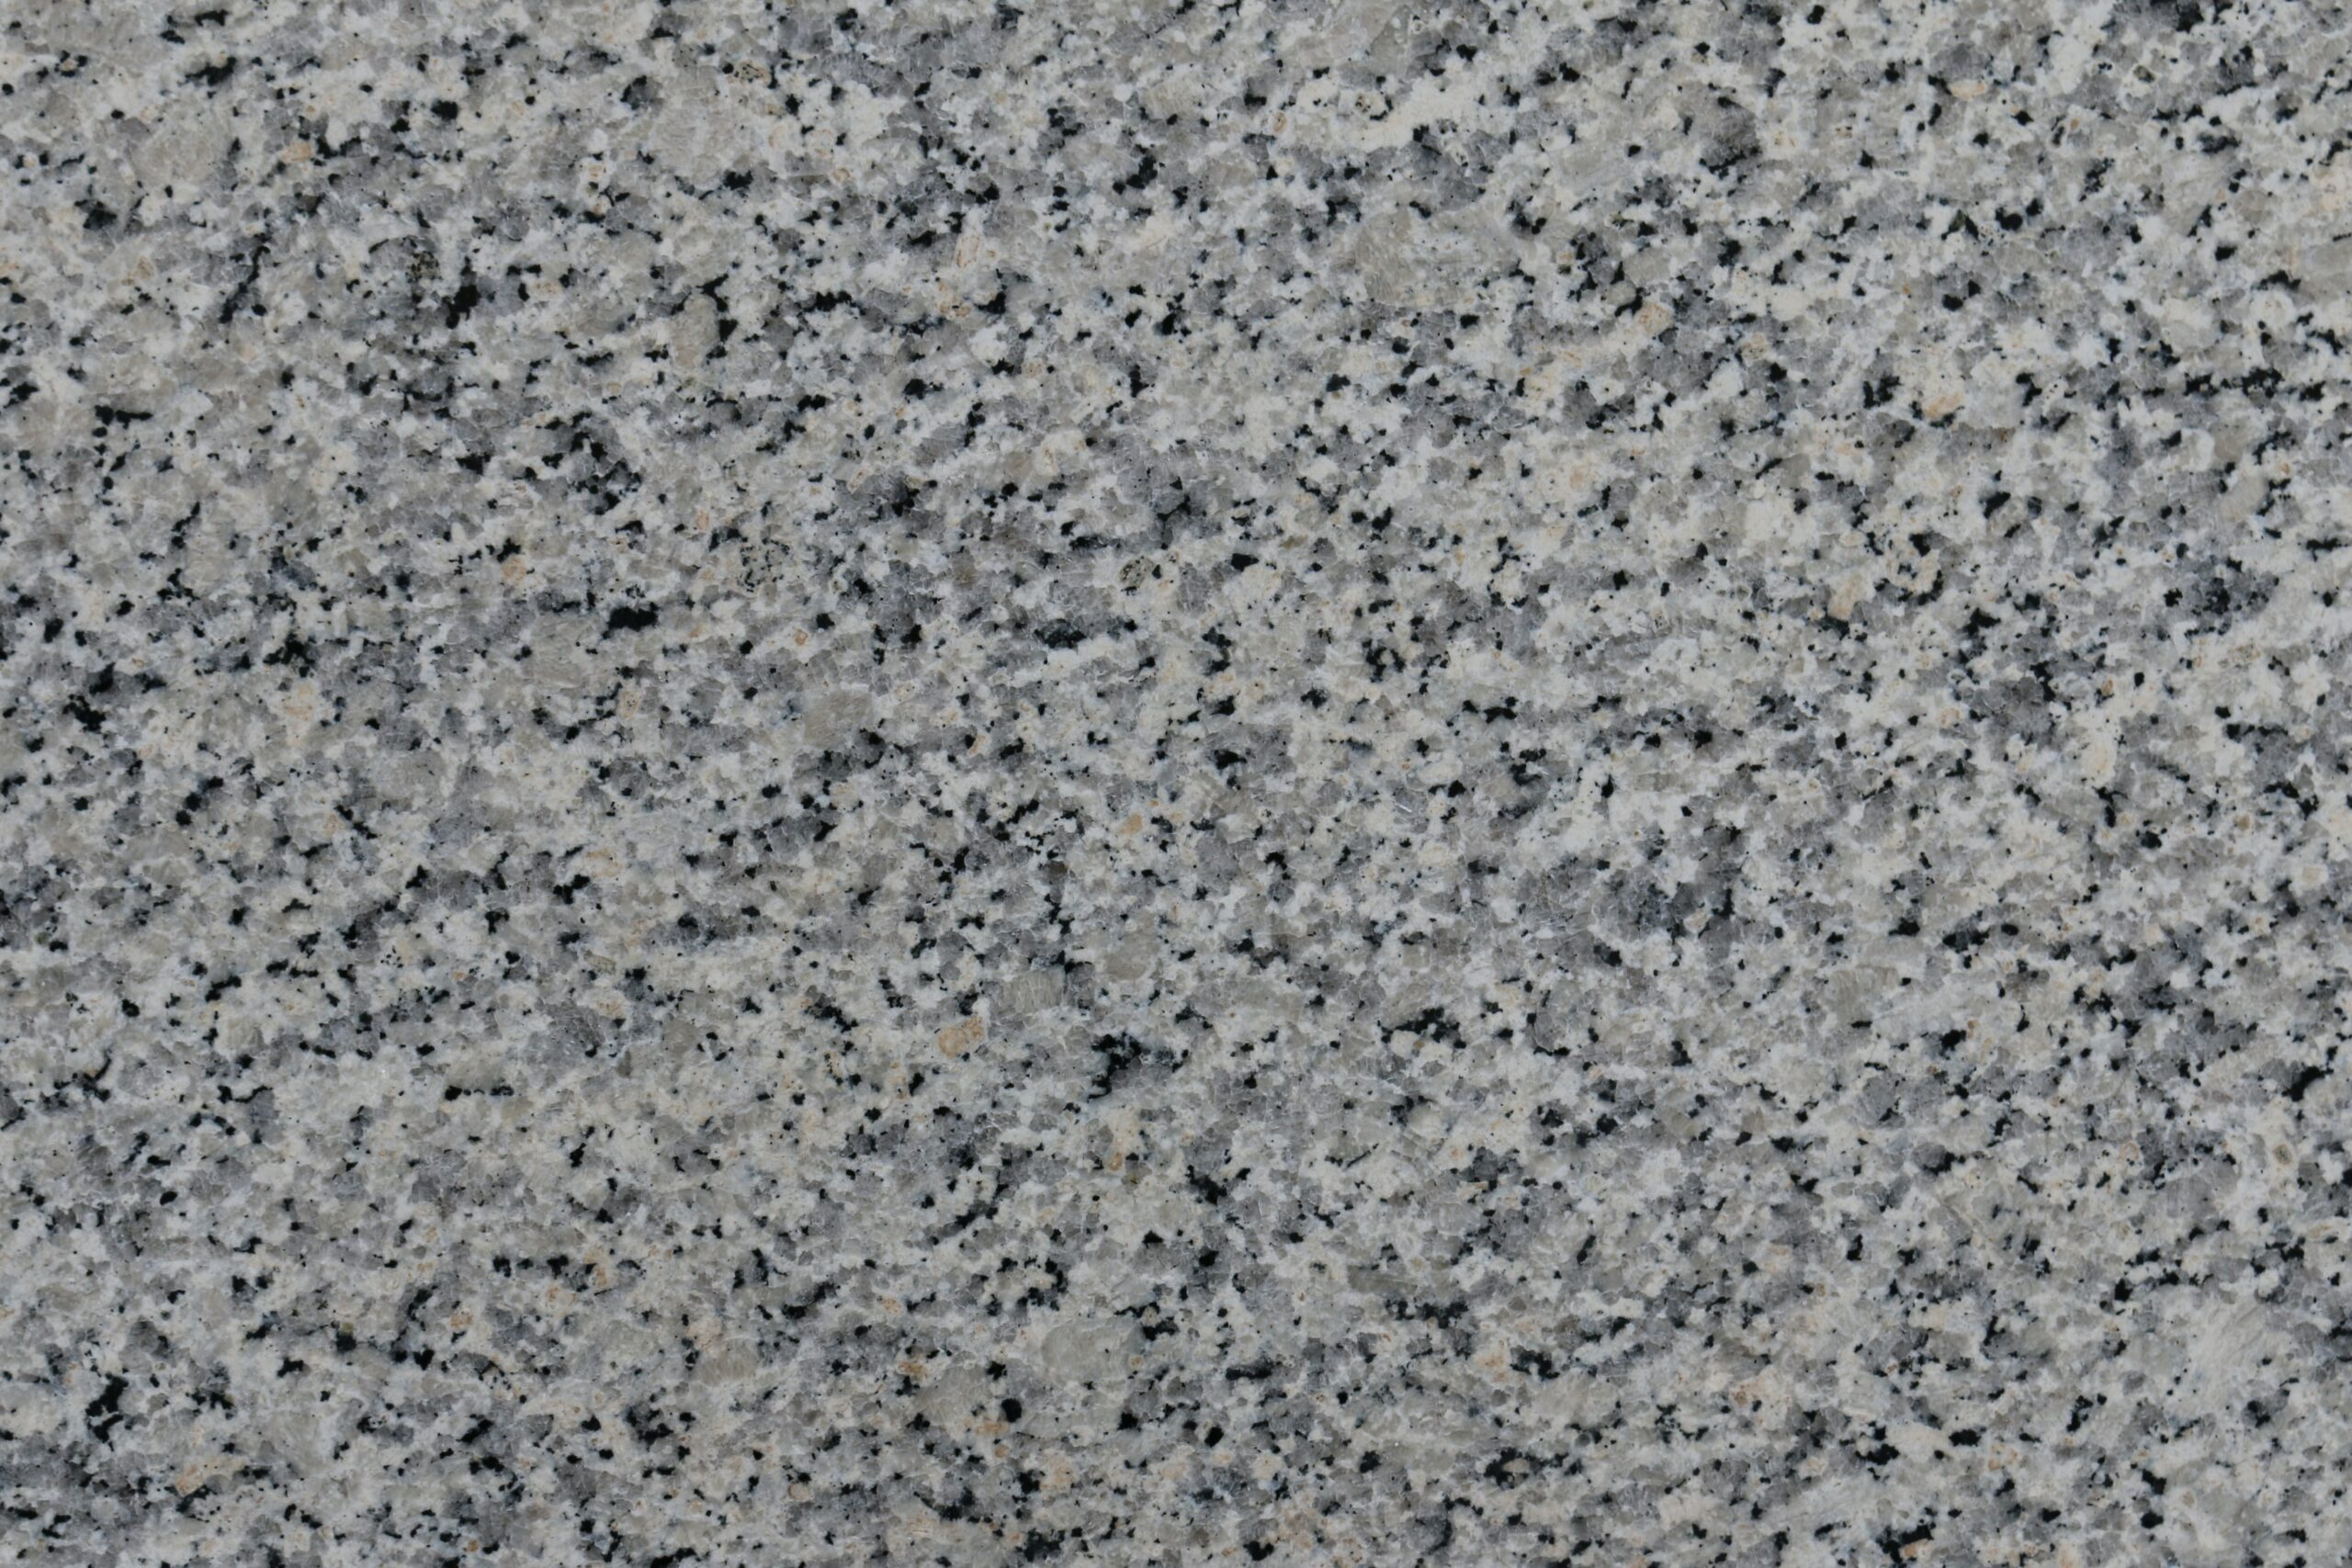 Grey Granite Stone Slab With Black Speckles